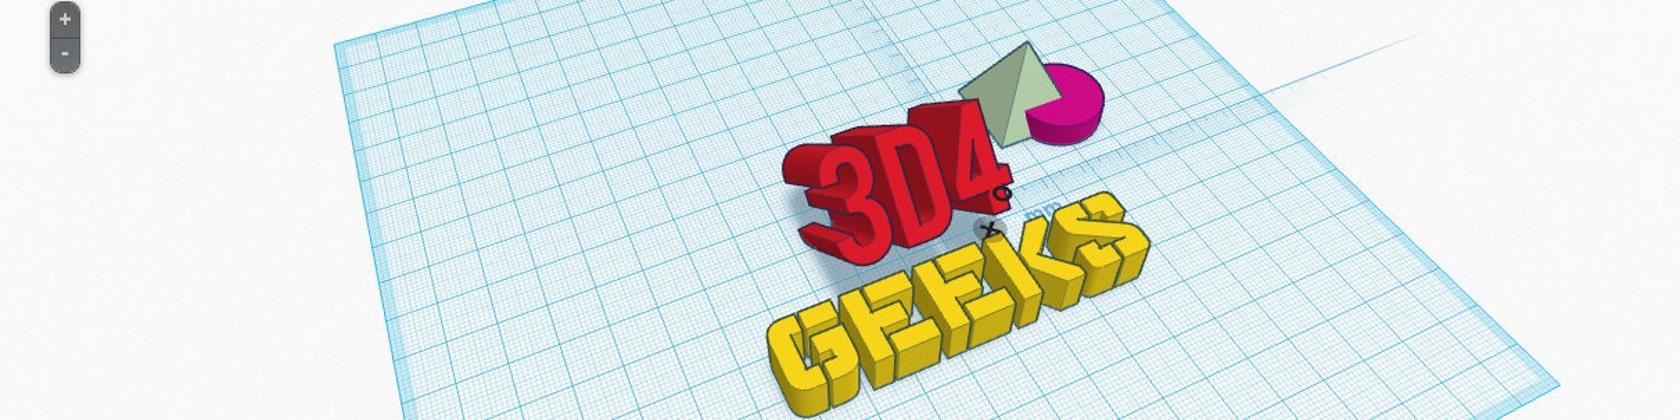 3D4Geeks: A 3D printing haven for the inner Nerd von 3d4Geeks